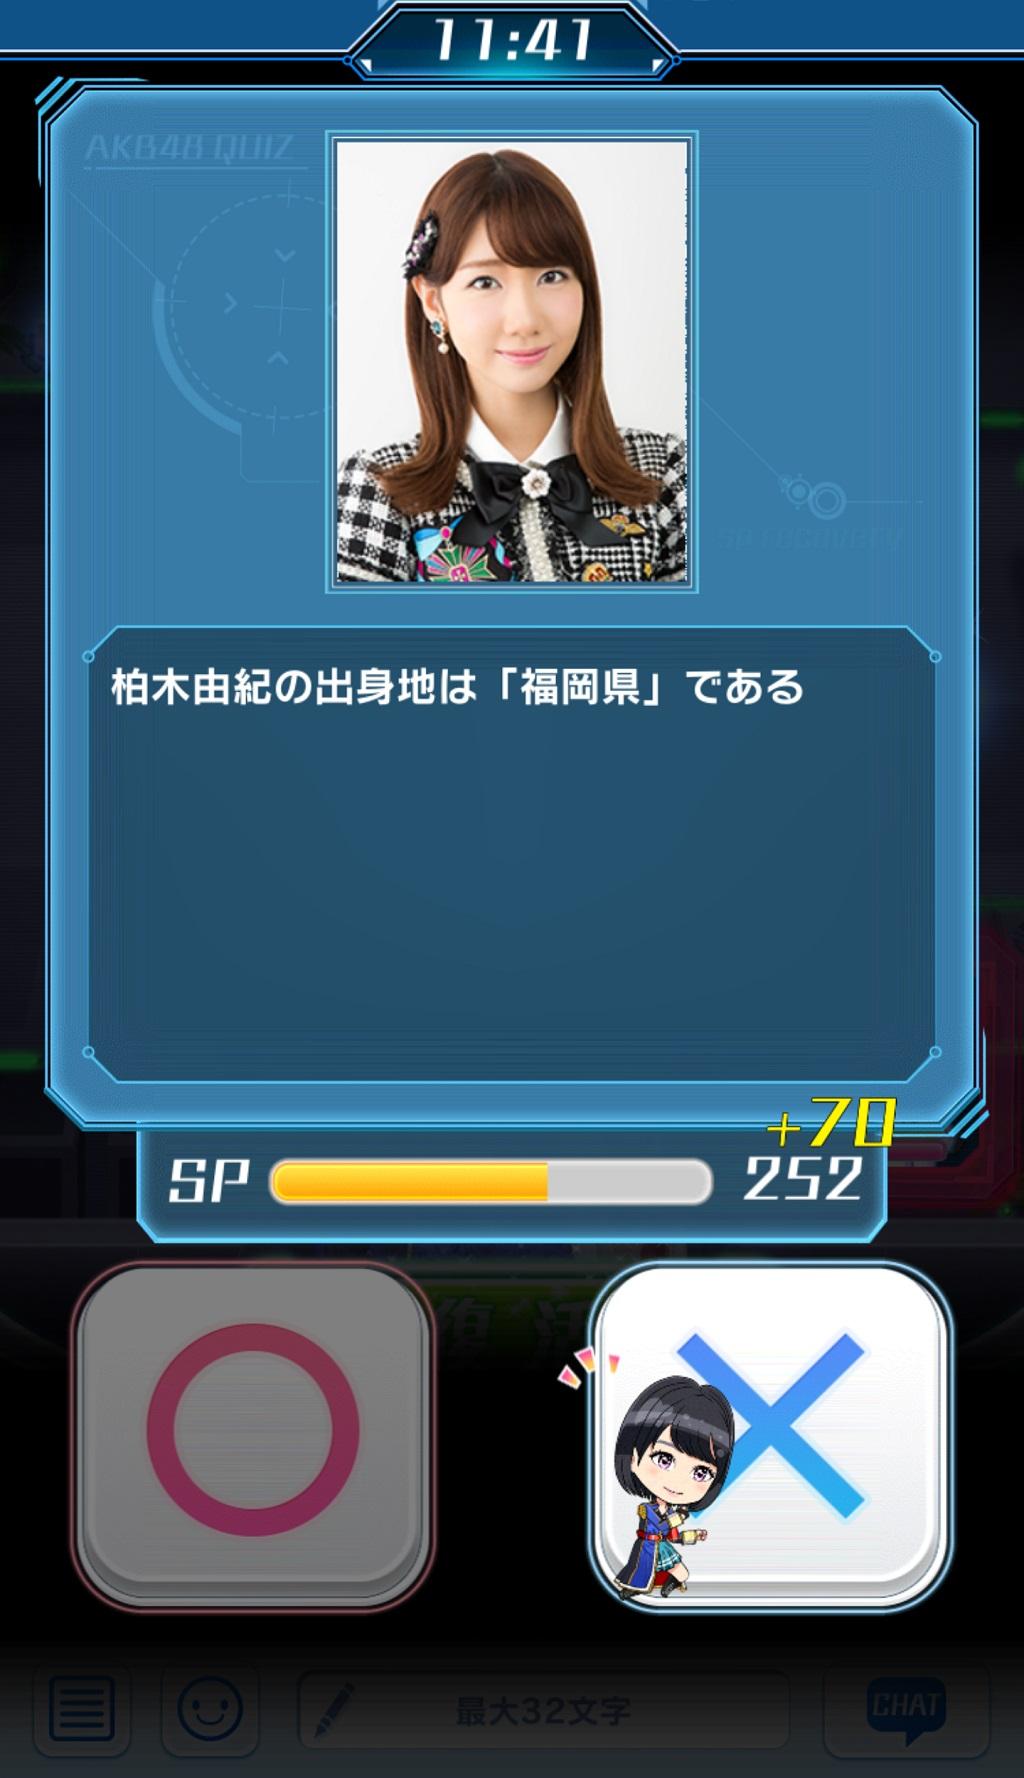 AKB48ステージファイター2 バトルフェスティバル【ゲームレビュー】